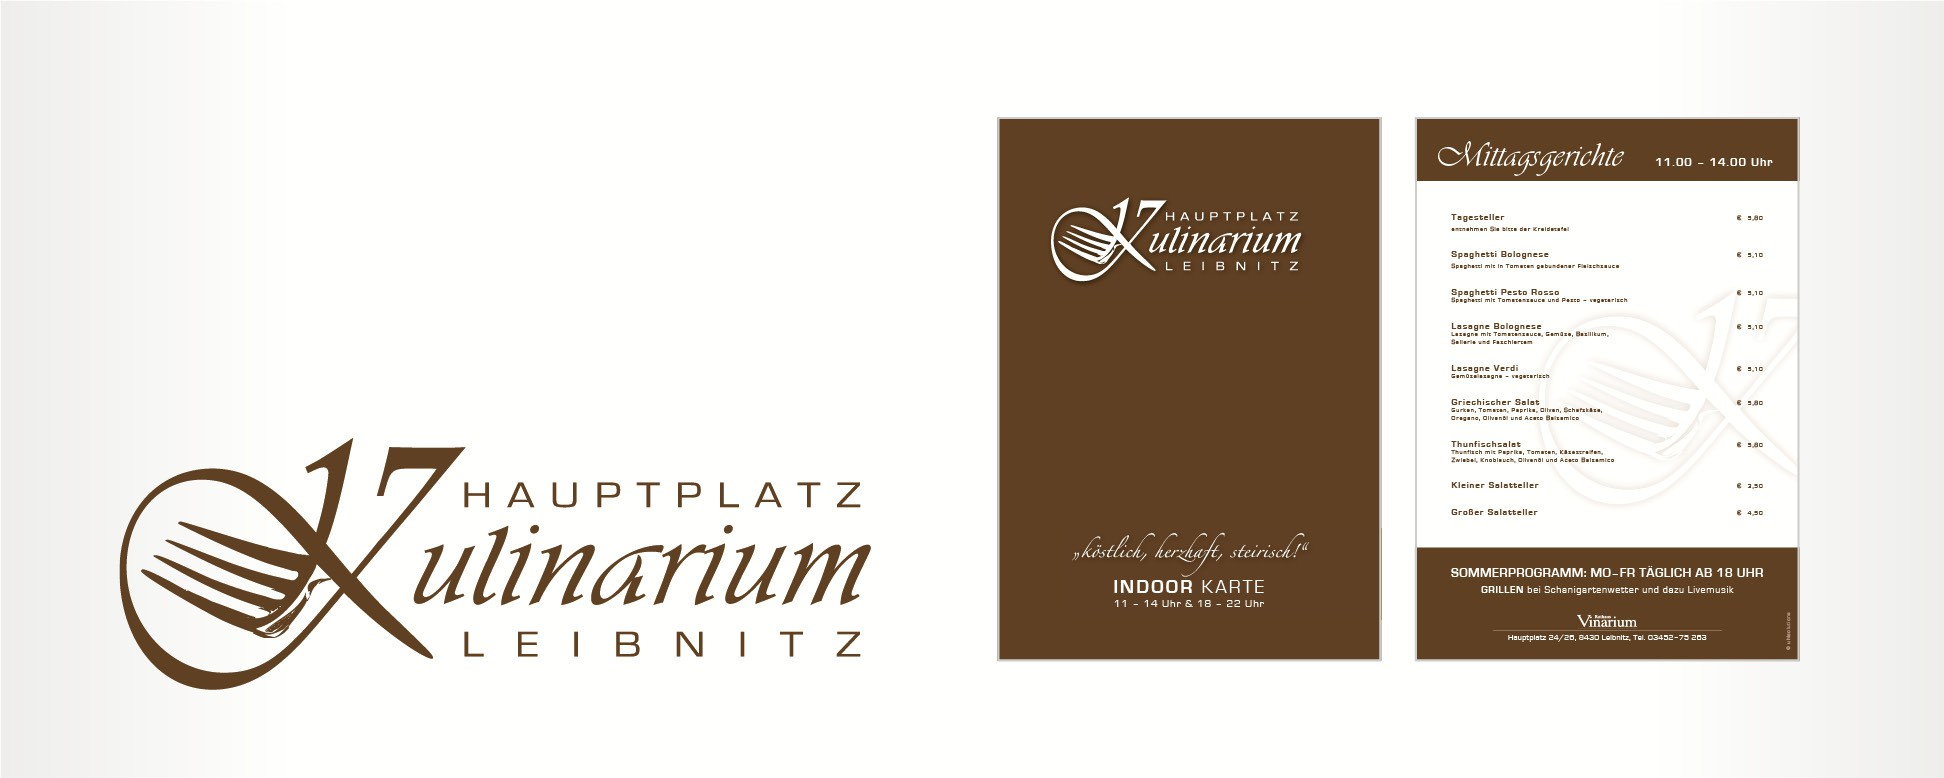 hauptplatz-Kulinarium